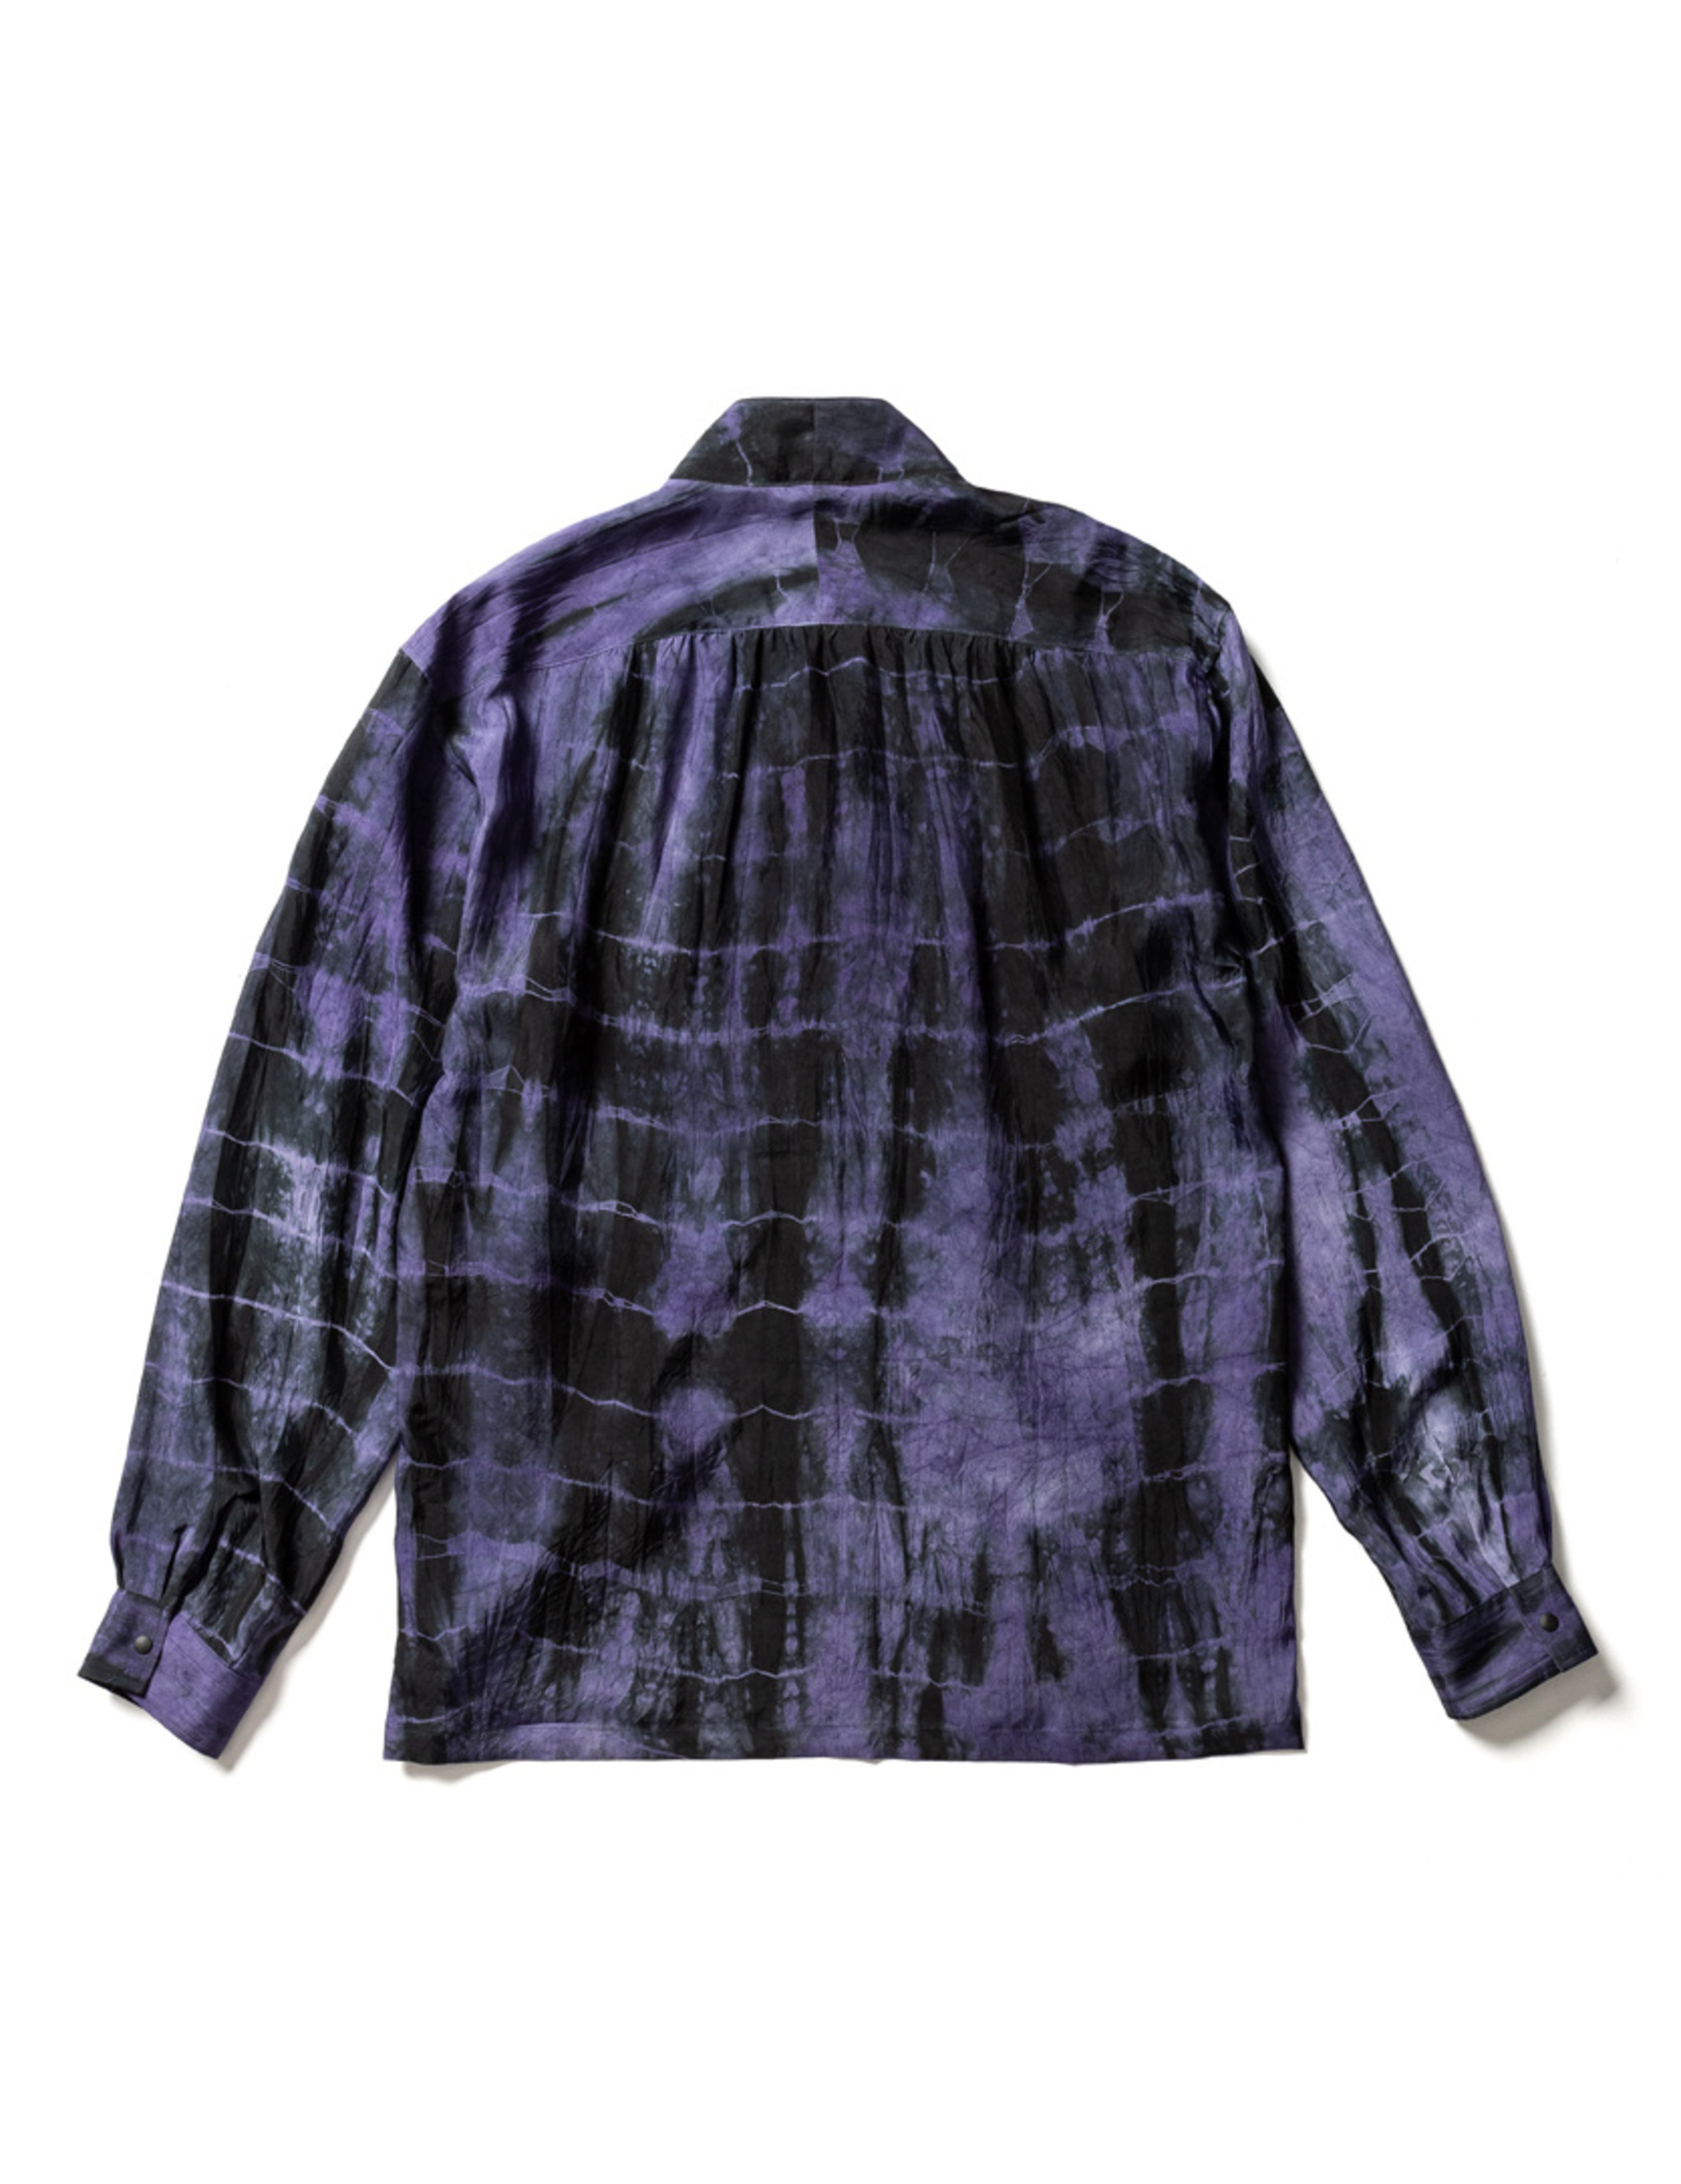 Sasquatchfabrix. ORIENTAL TIE DYE WA-NECK L/S SHIRT - BLACK PATTERN